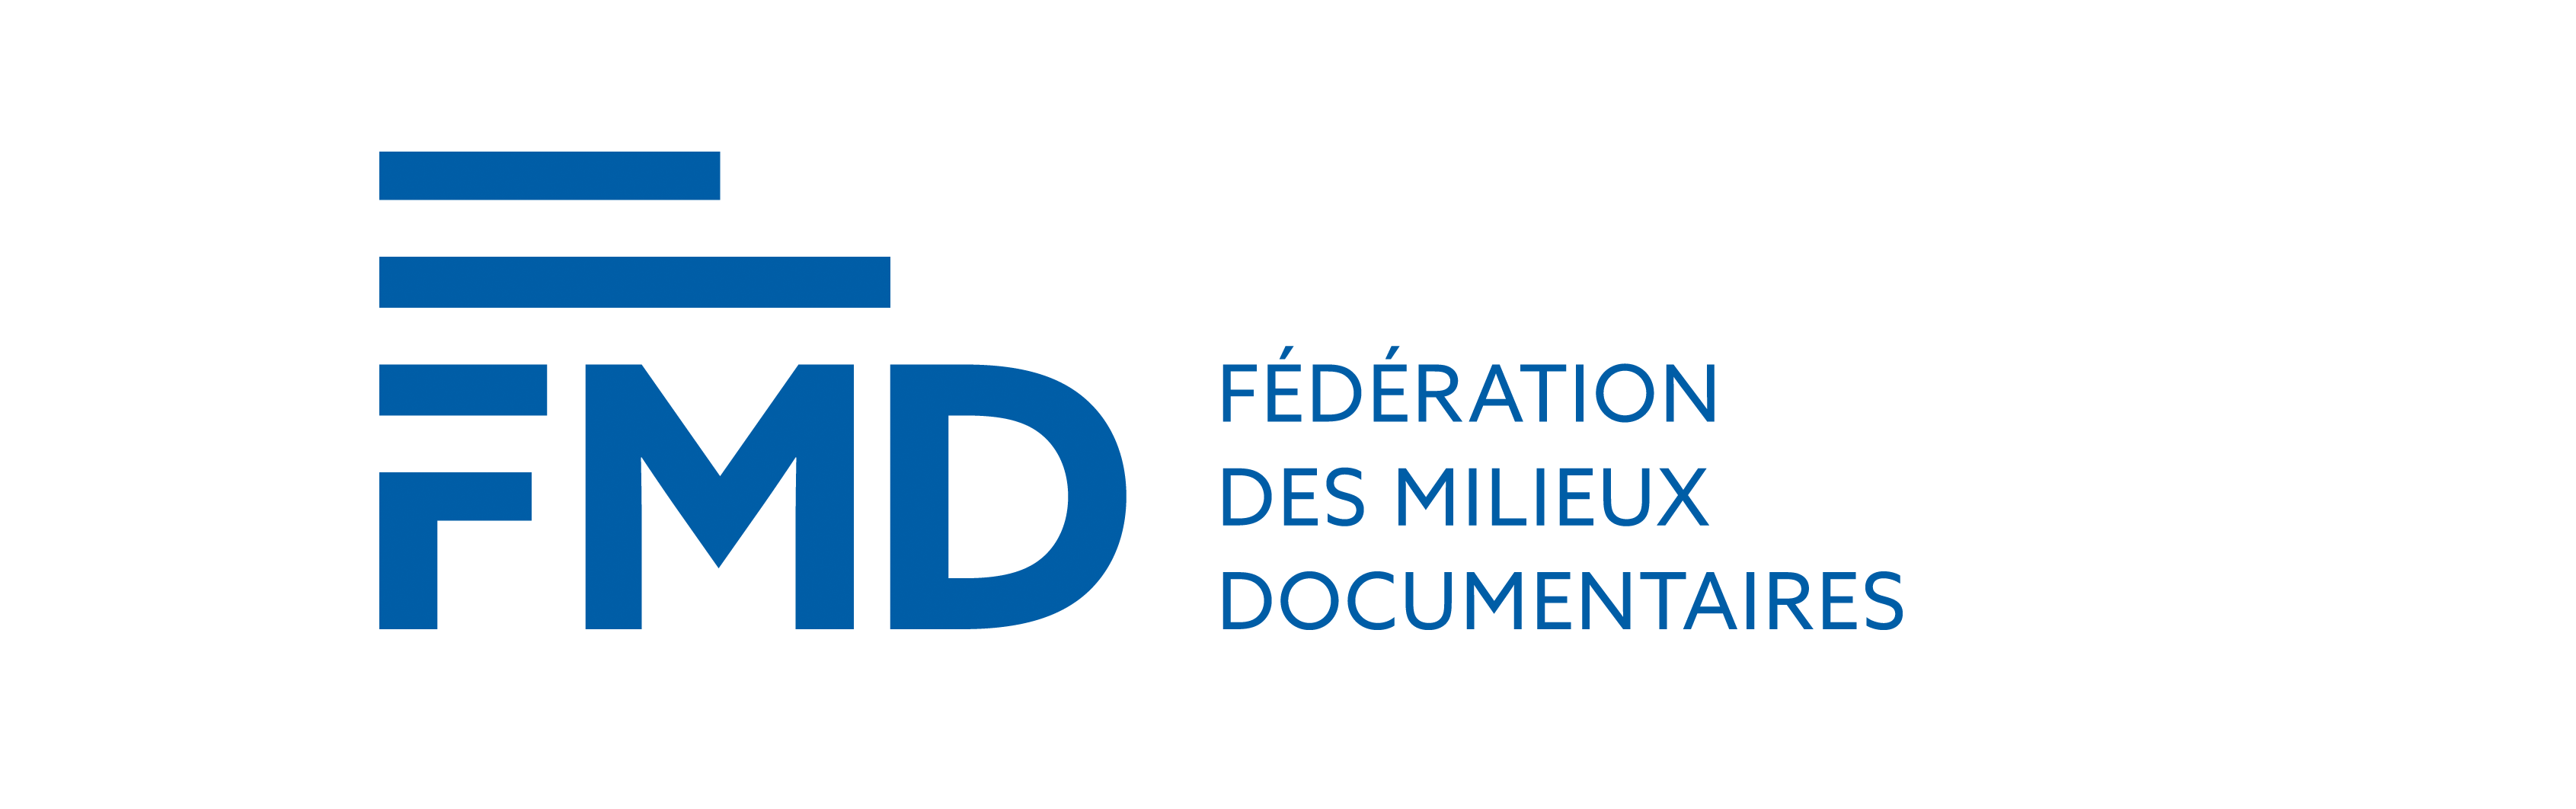 Forum FMD